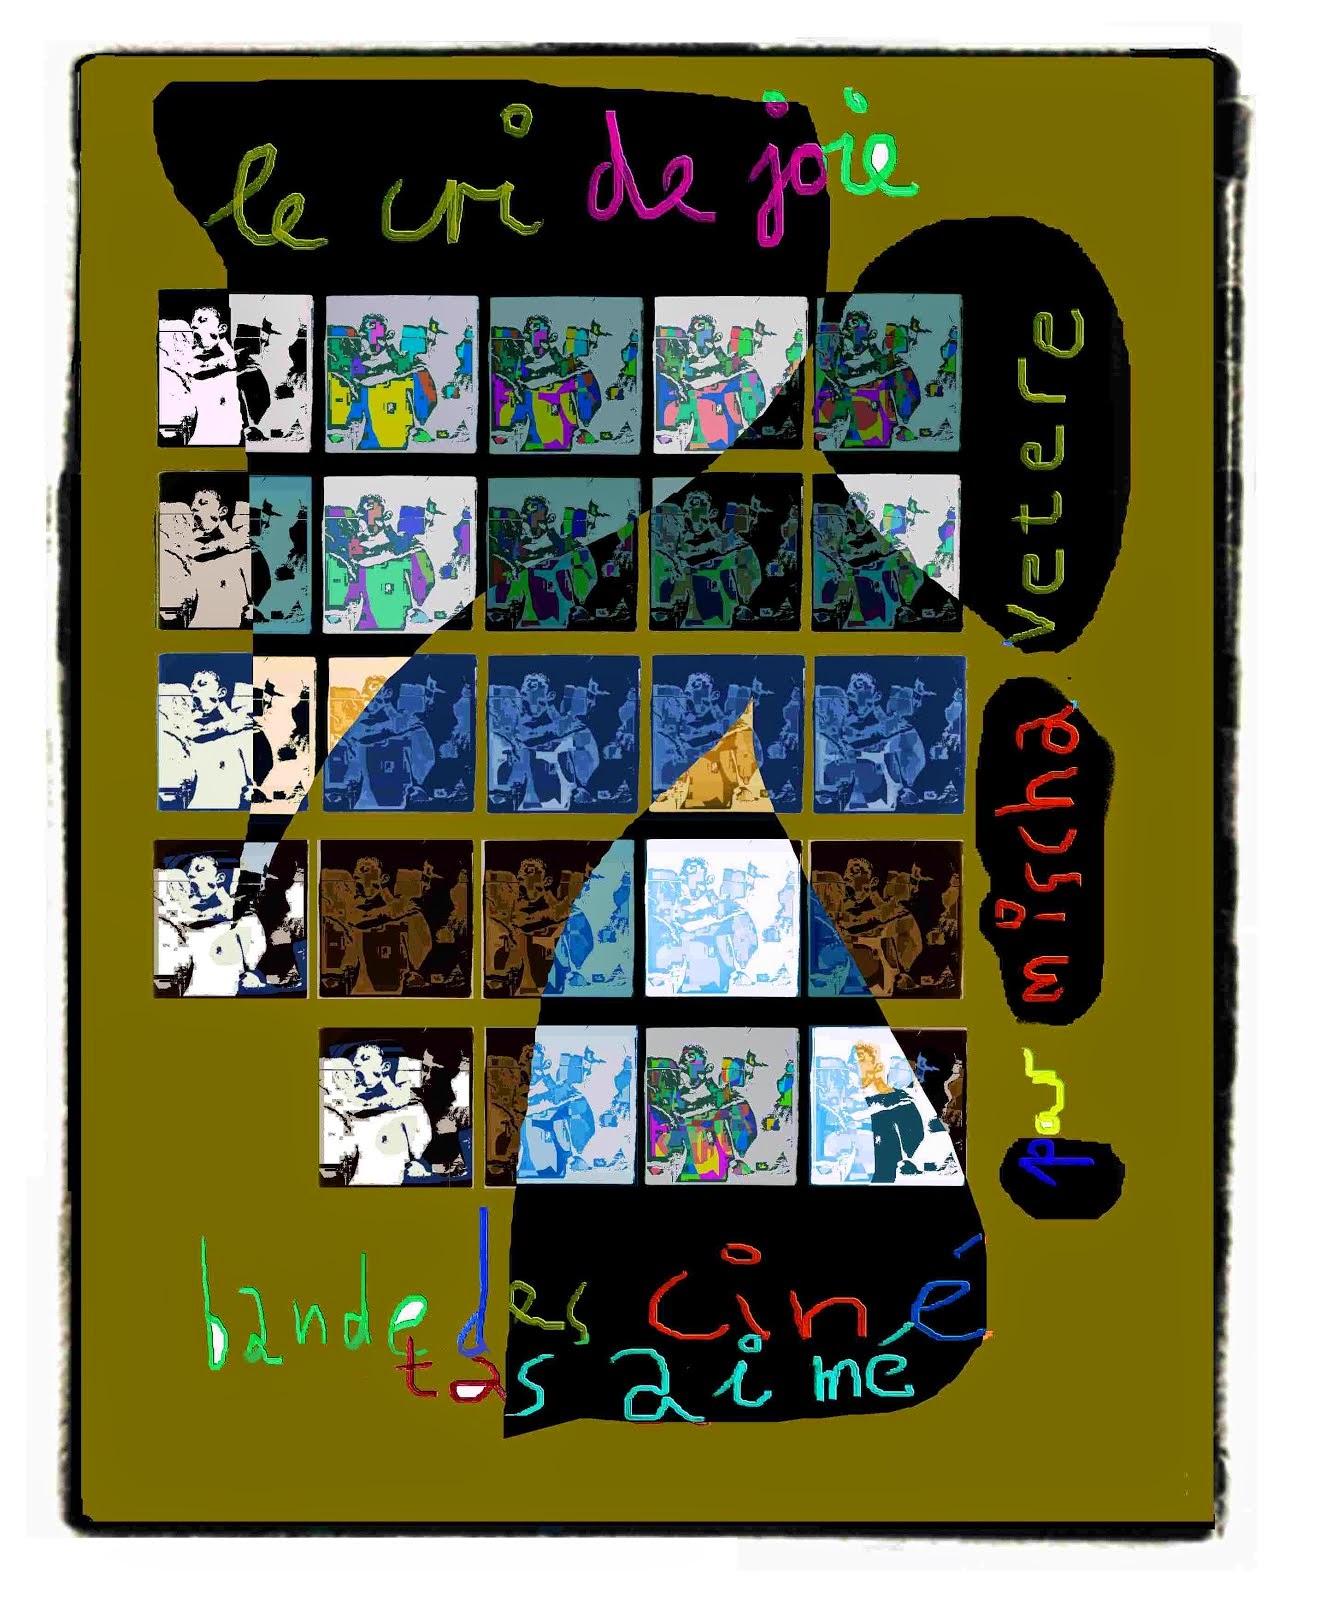 COMICmesse berlin 2015 LA RÉVOLUTION MENTALE mischa vetere culture FRANCE allemagne bande dessinée